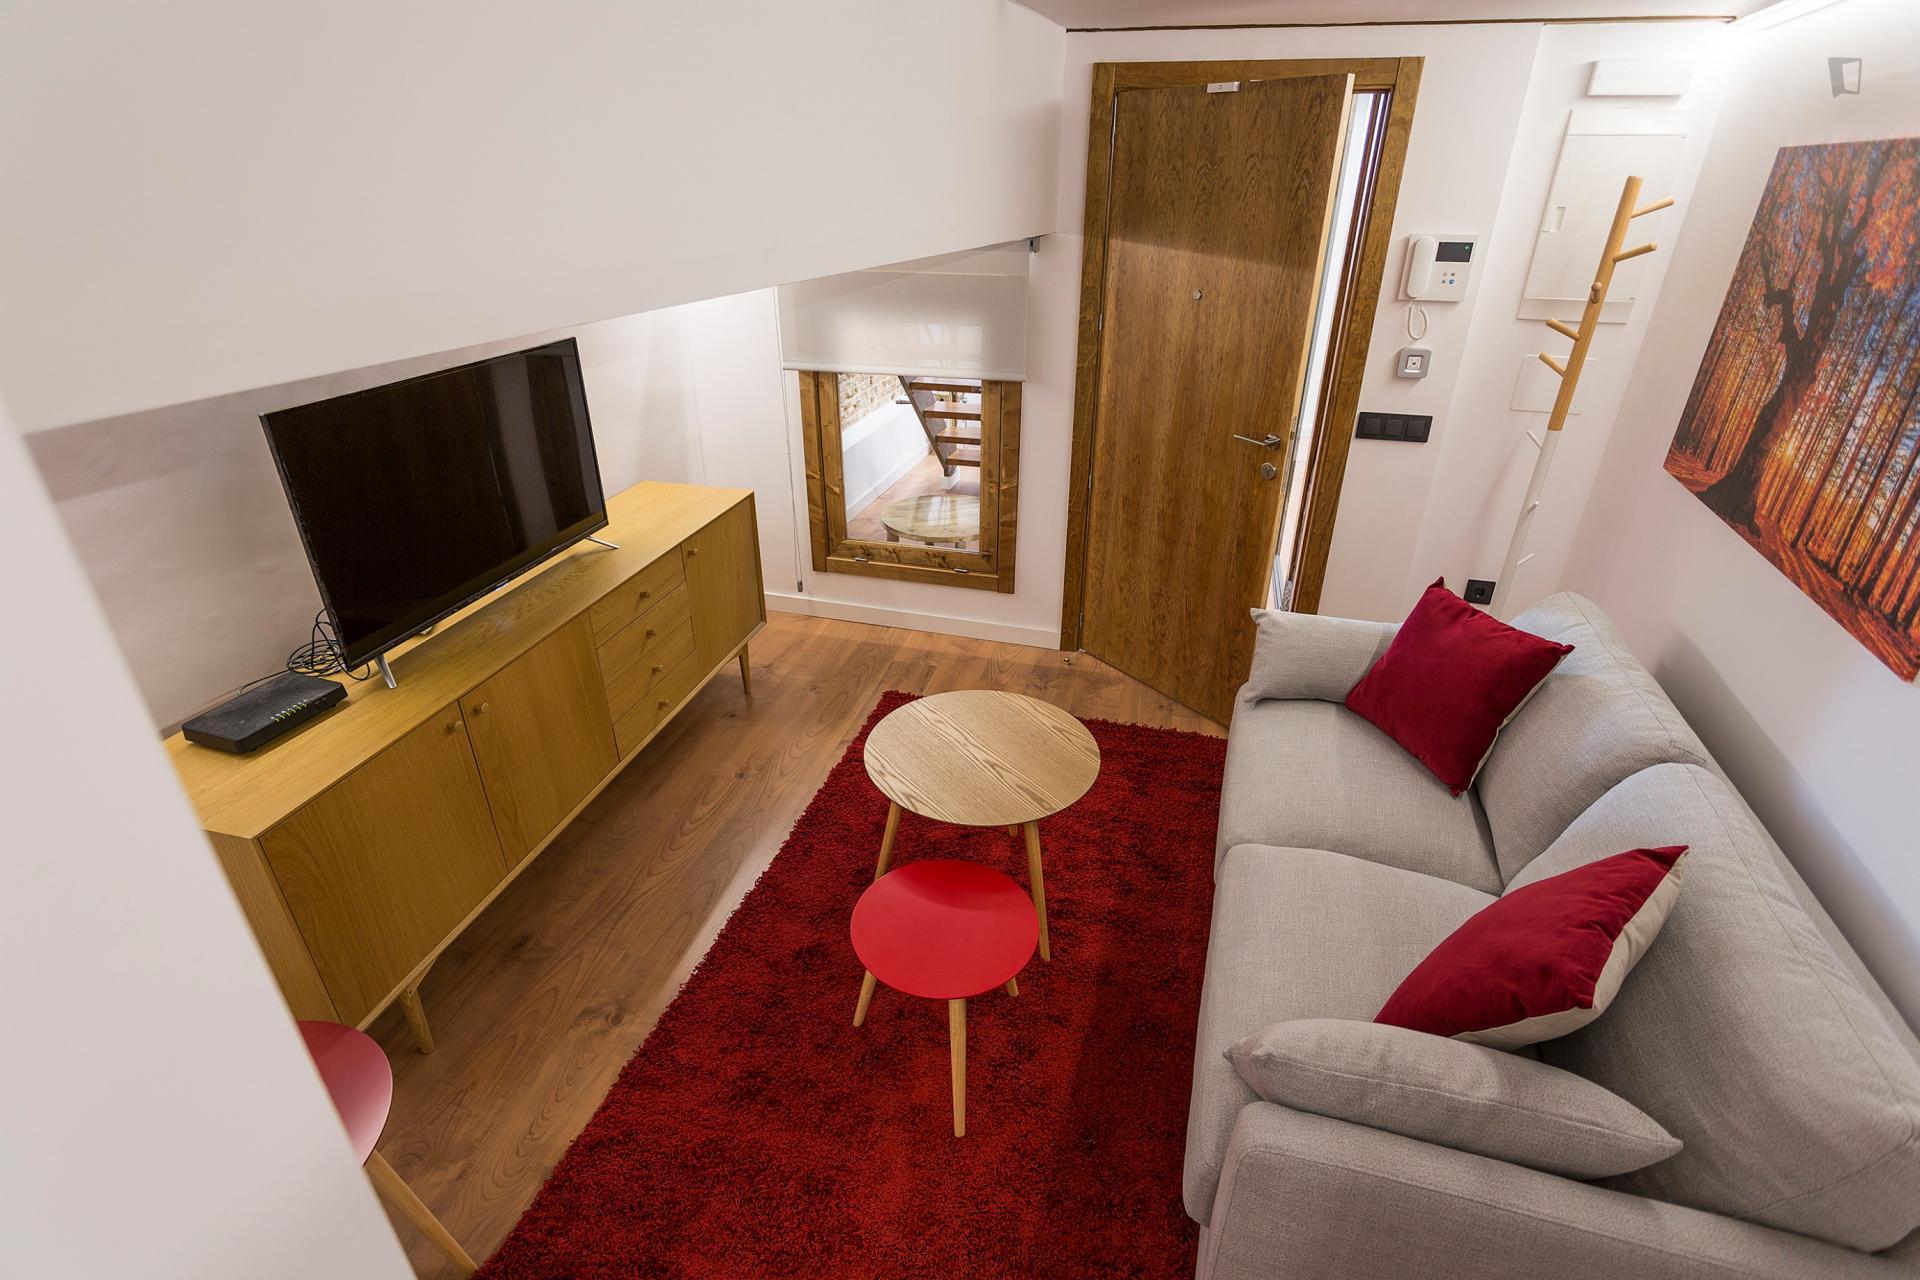 Torrecilla 2 - One bedroom flat in Madrid